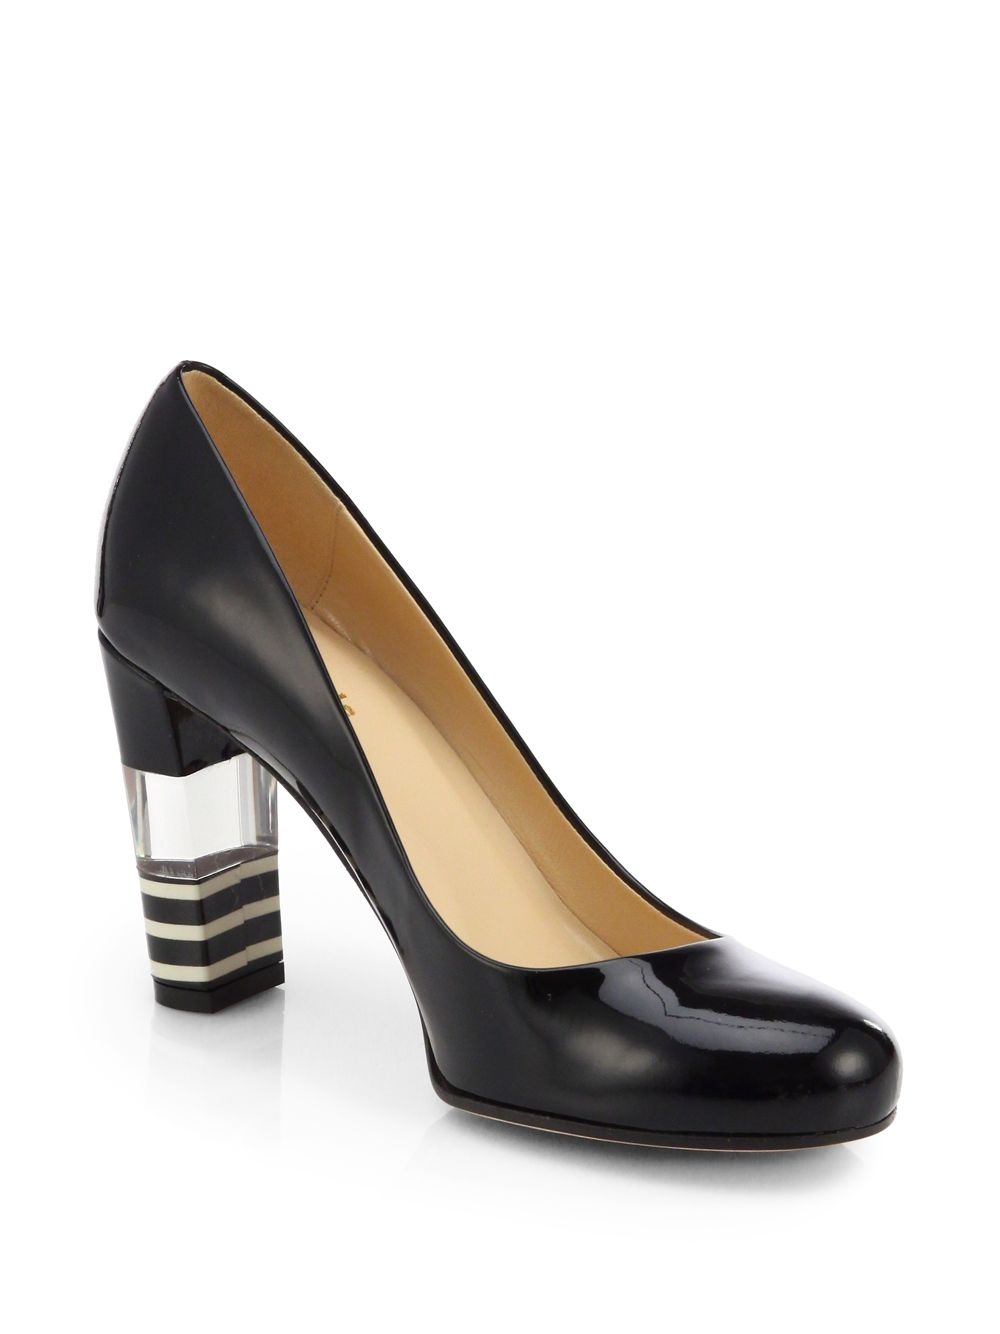 Lyst - Kate Spade Leslie Patent Leather Lucite-Heel Pumps Black in Black